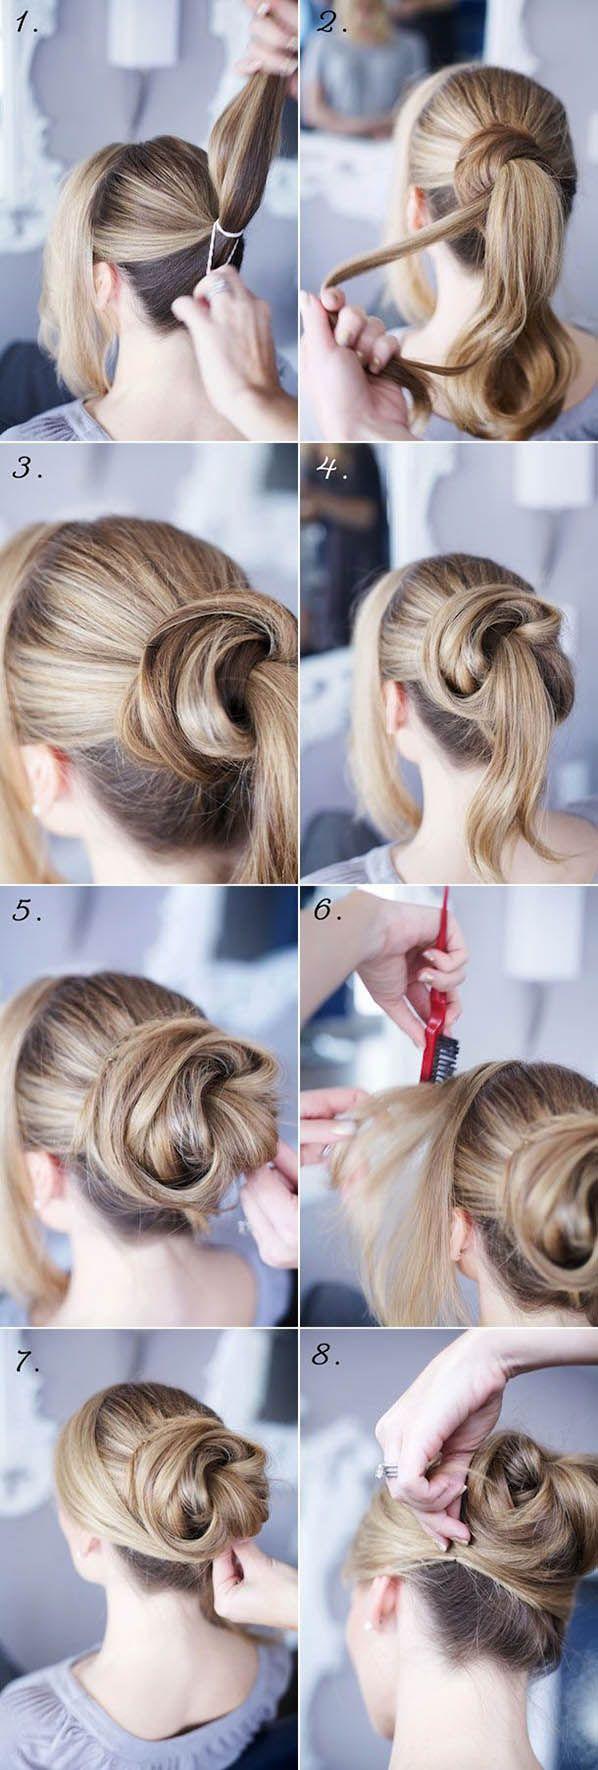 Hair tutorials diy hair haarstylen pinterest diy hair